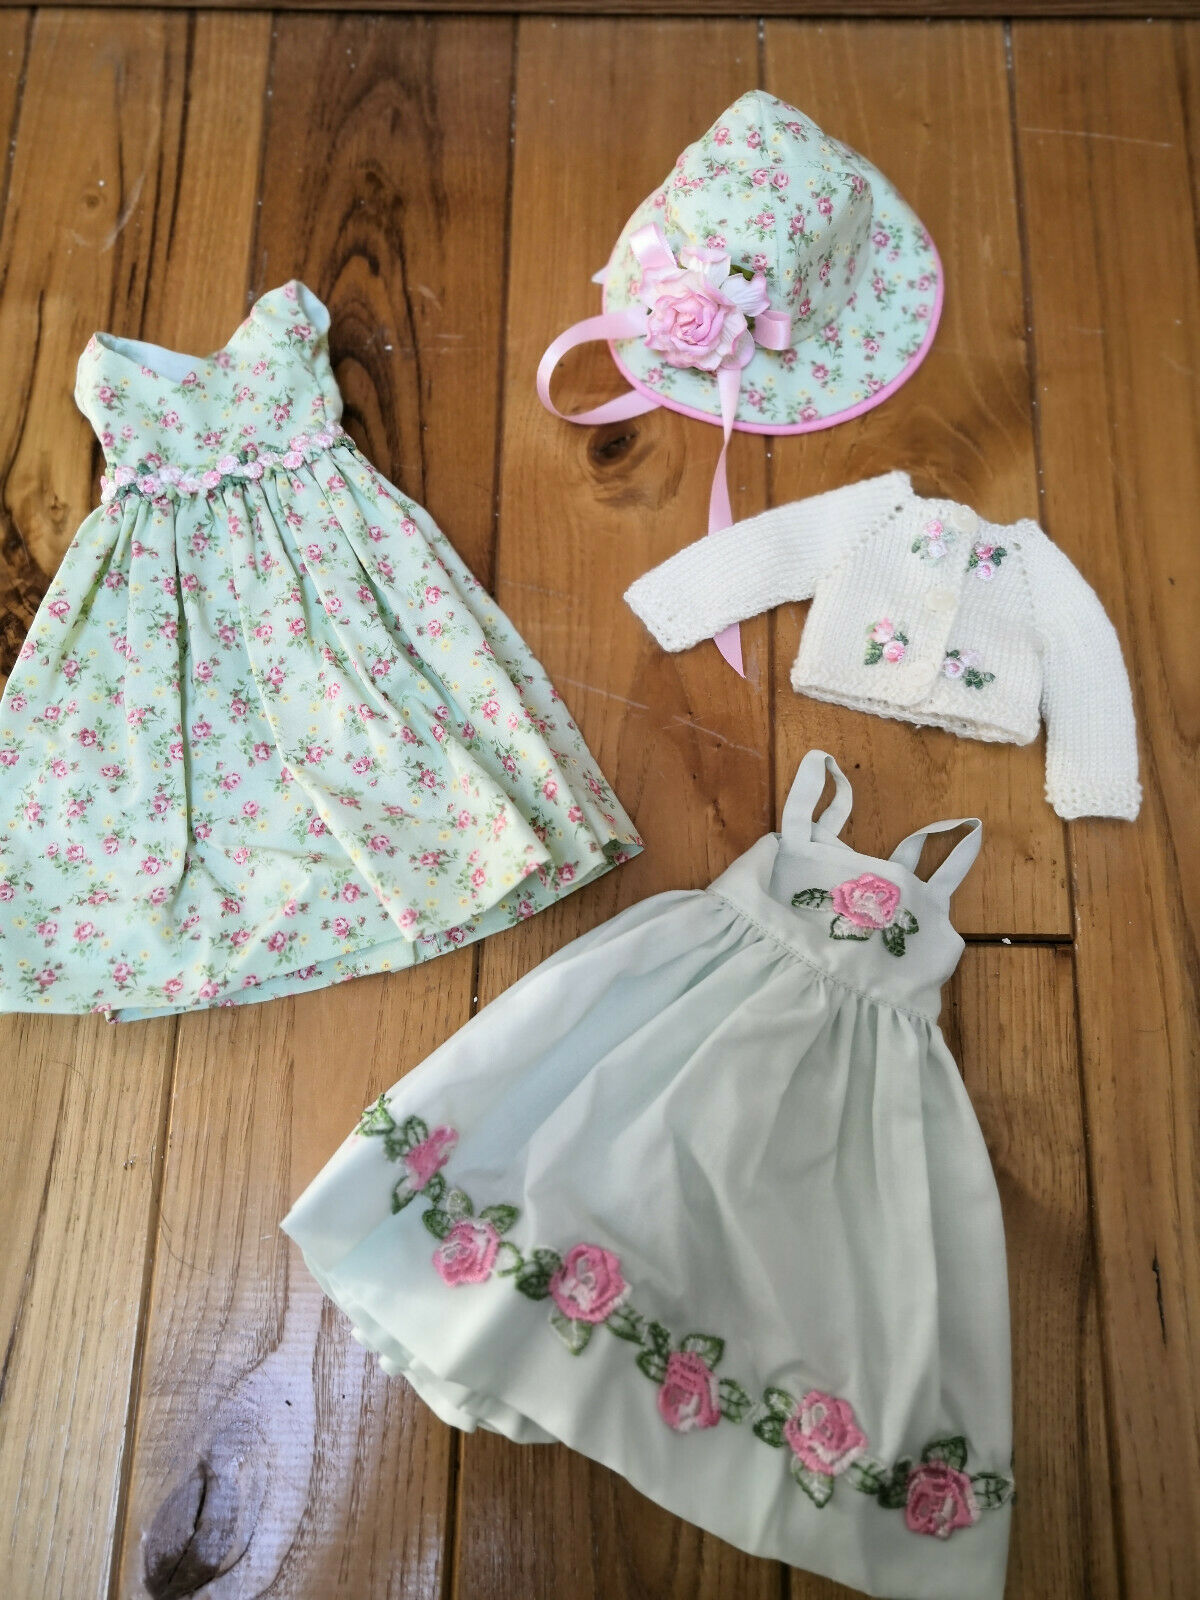 Monet's meadow OOAK outfit for Effner 13  Little Darling by Glorias Garden